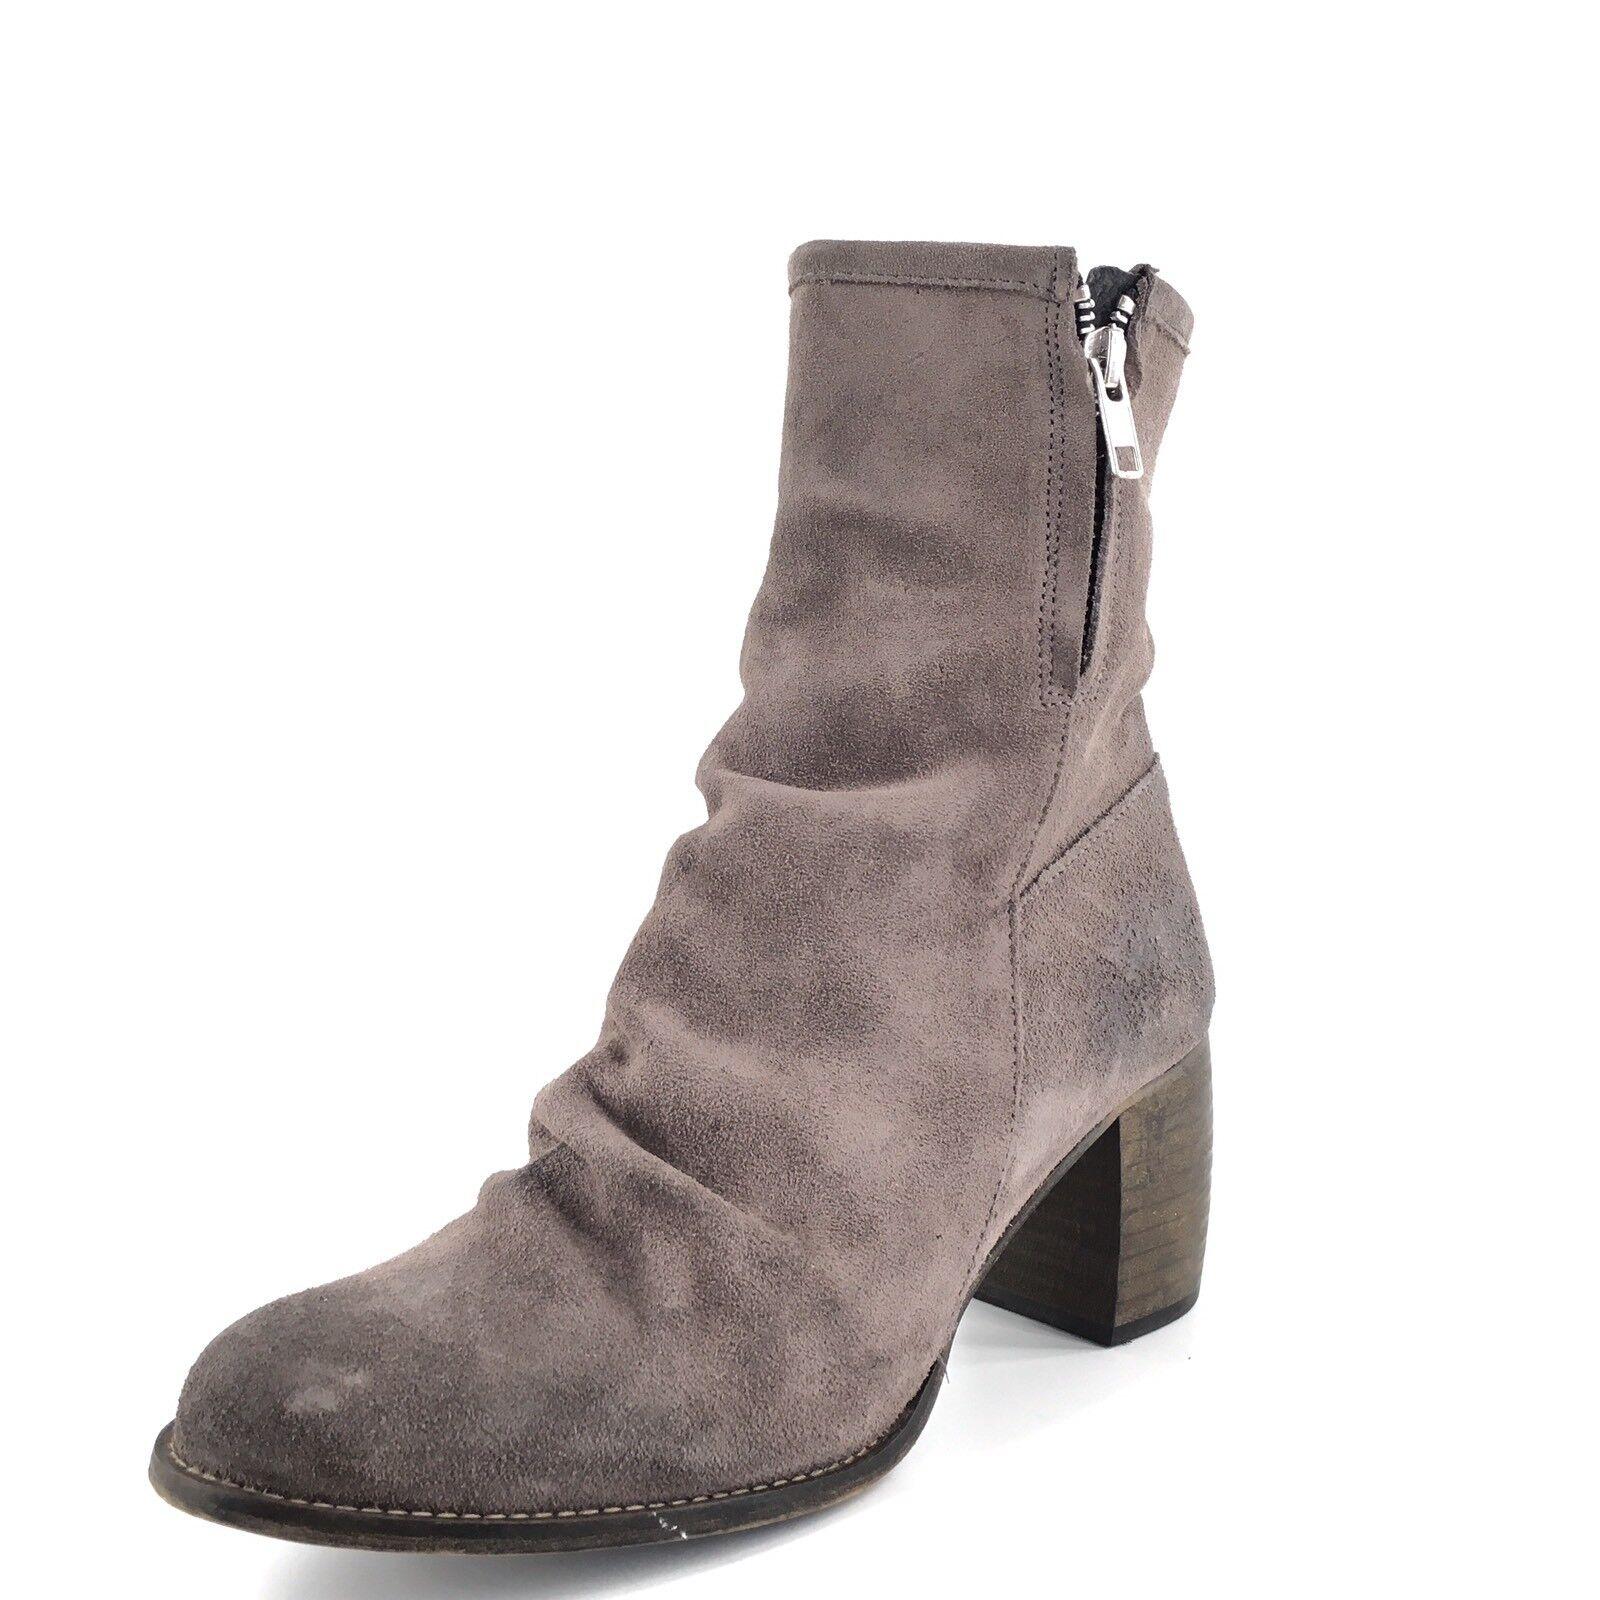 Jeffrey Campbell Ruched Grey Suede Zip Short Zip Boots Women's Size 7.5 M